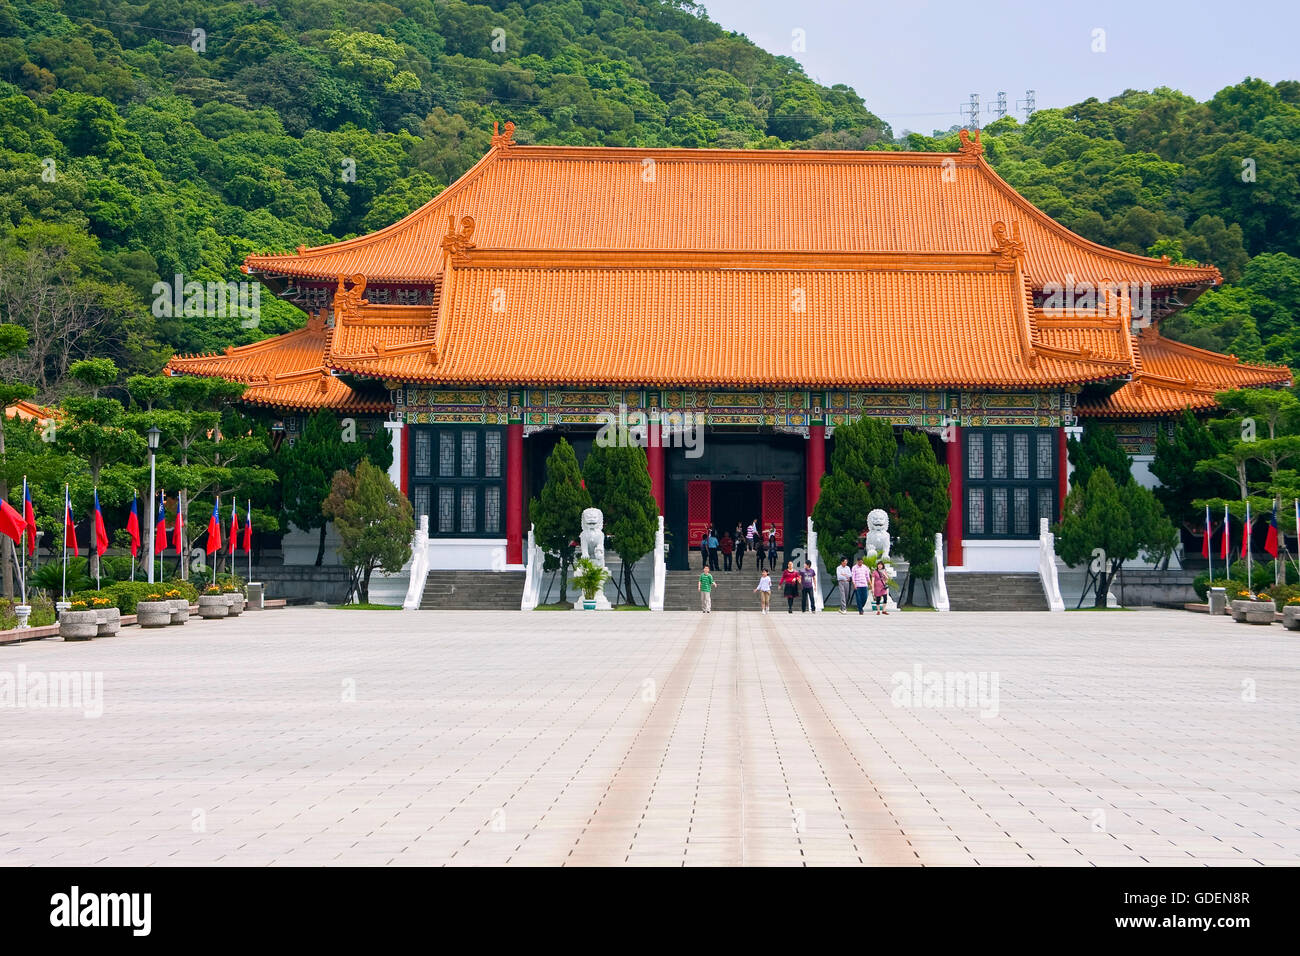 Temple at memorial monument, Taipeh, Taiwan - Stock Image